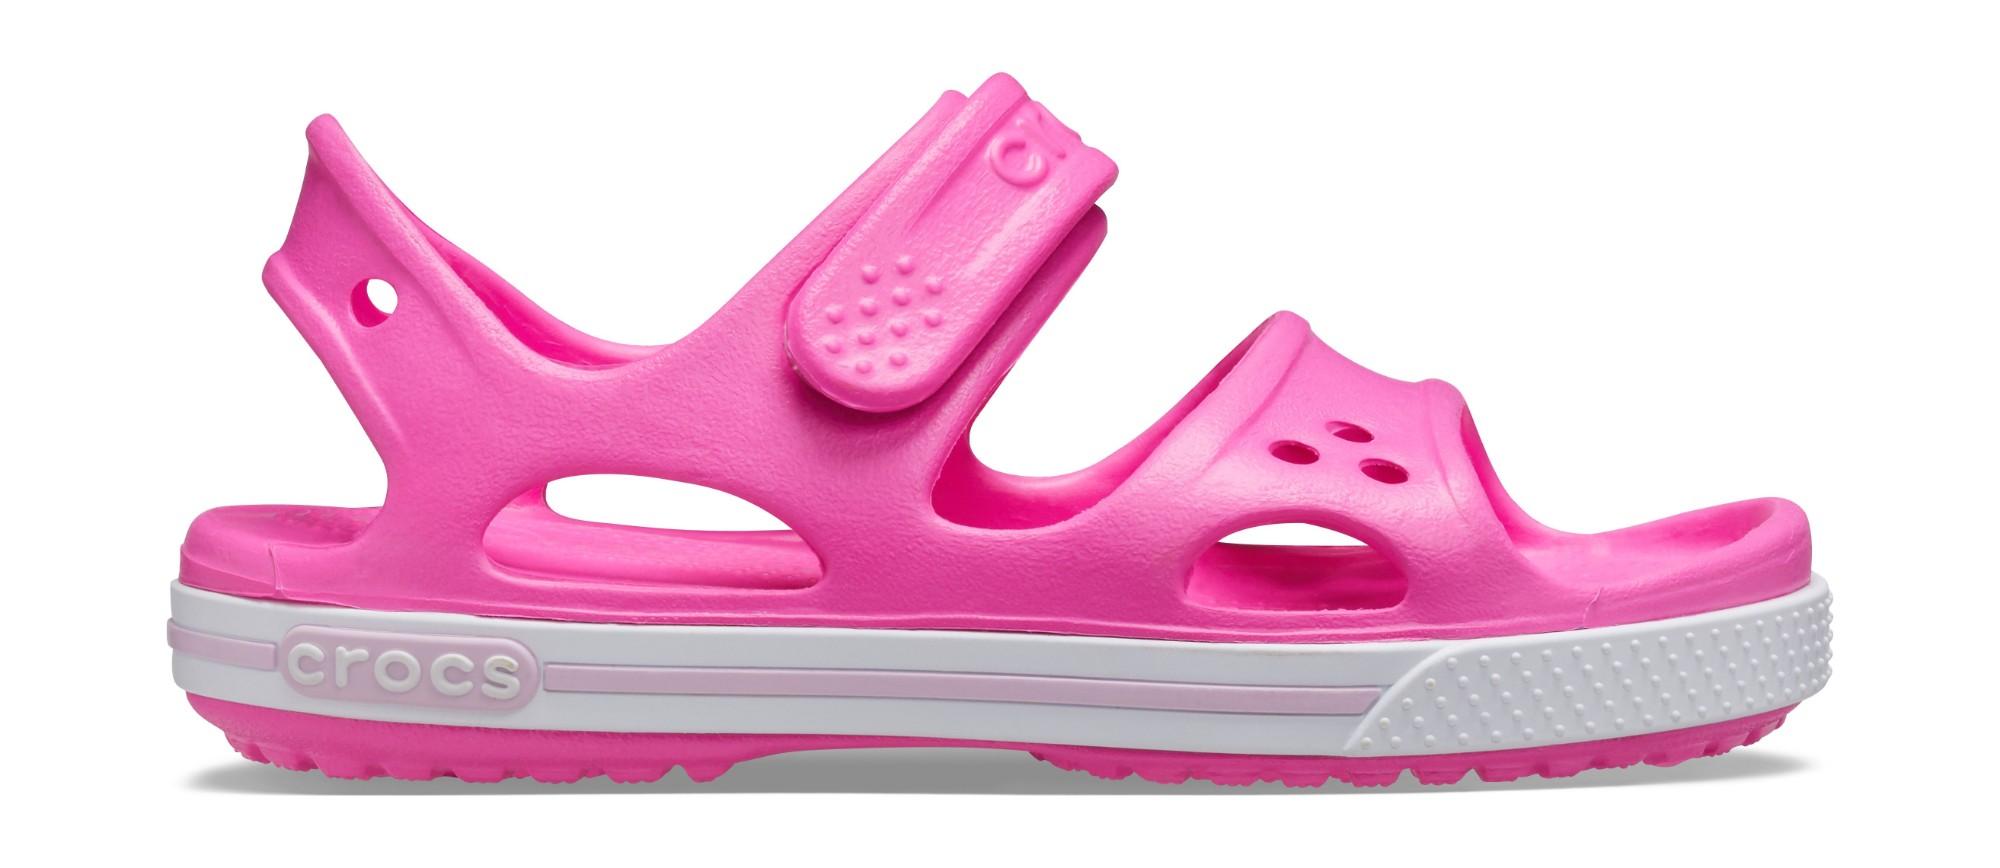 Crocs™ Kids' Crocband II Sandal PS Electric Pink 28